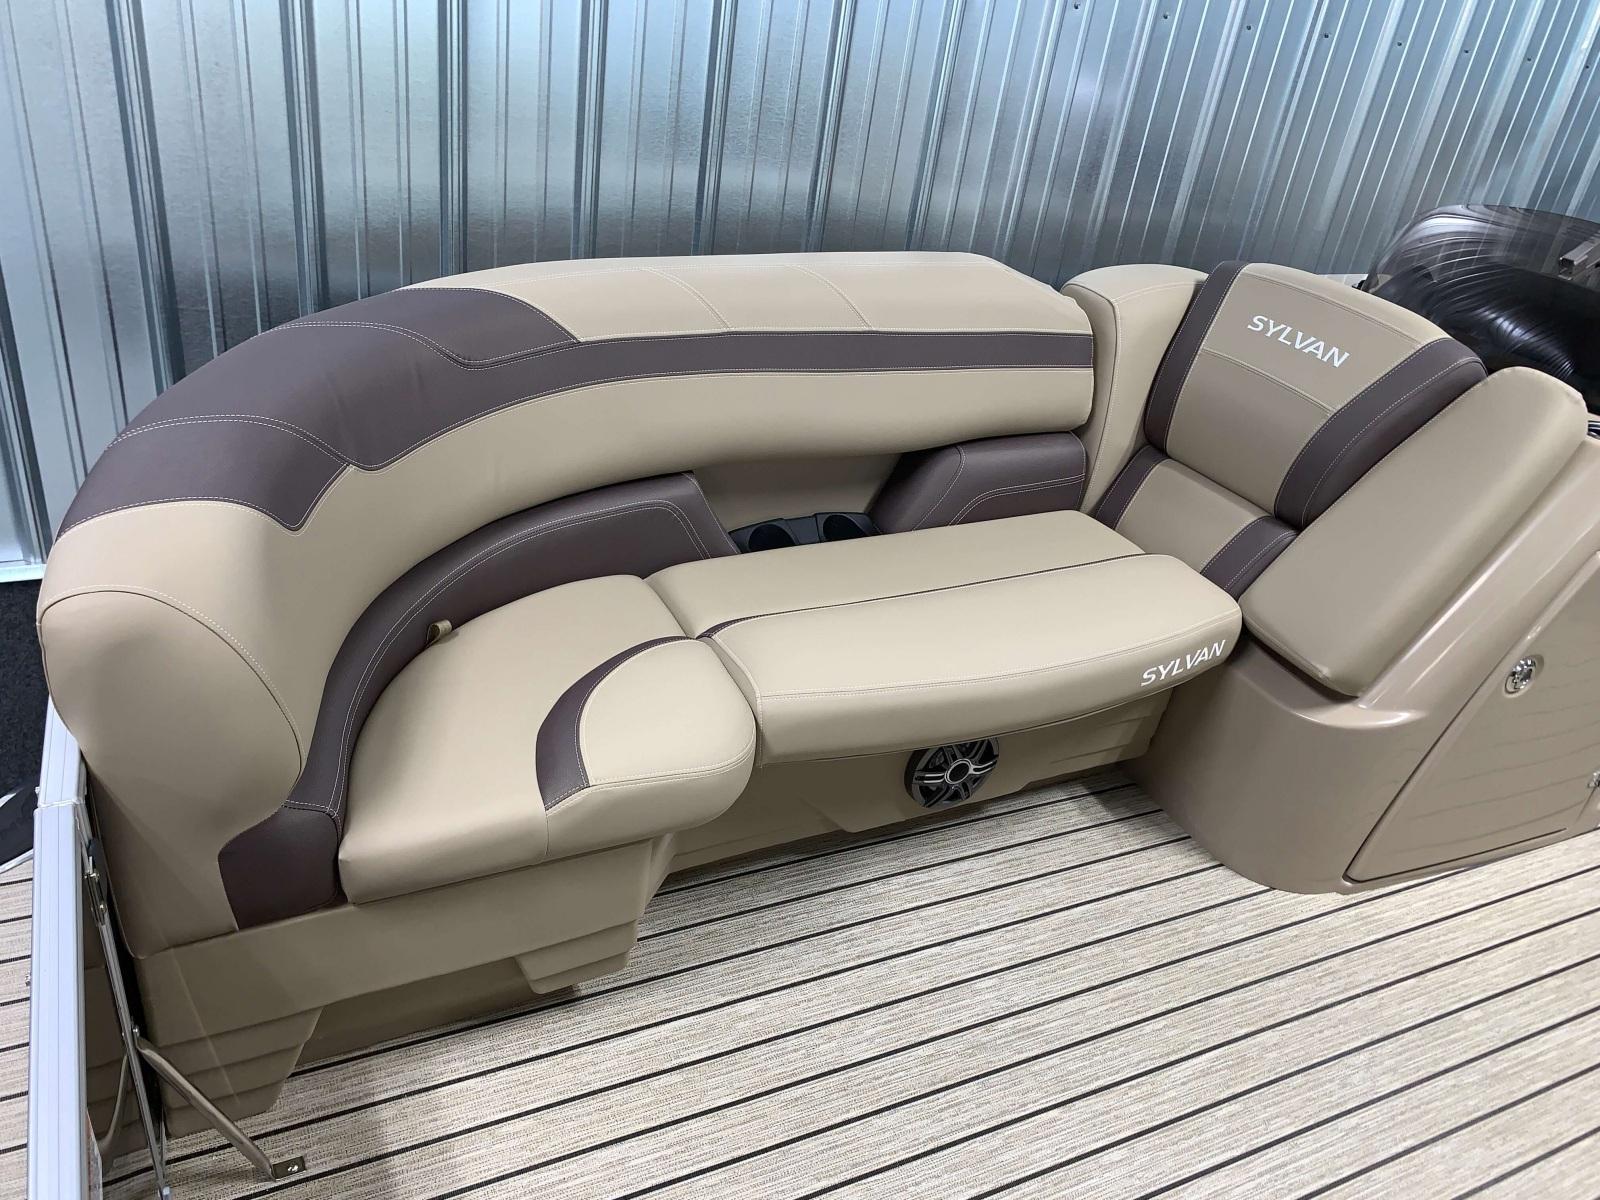 Tan Interior of the 2021 Sylvan L1 Cruise Pontoon Boat